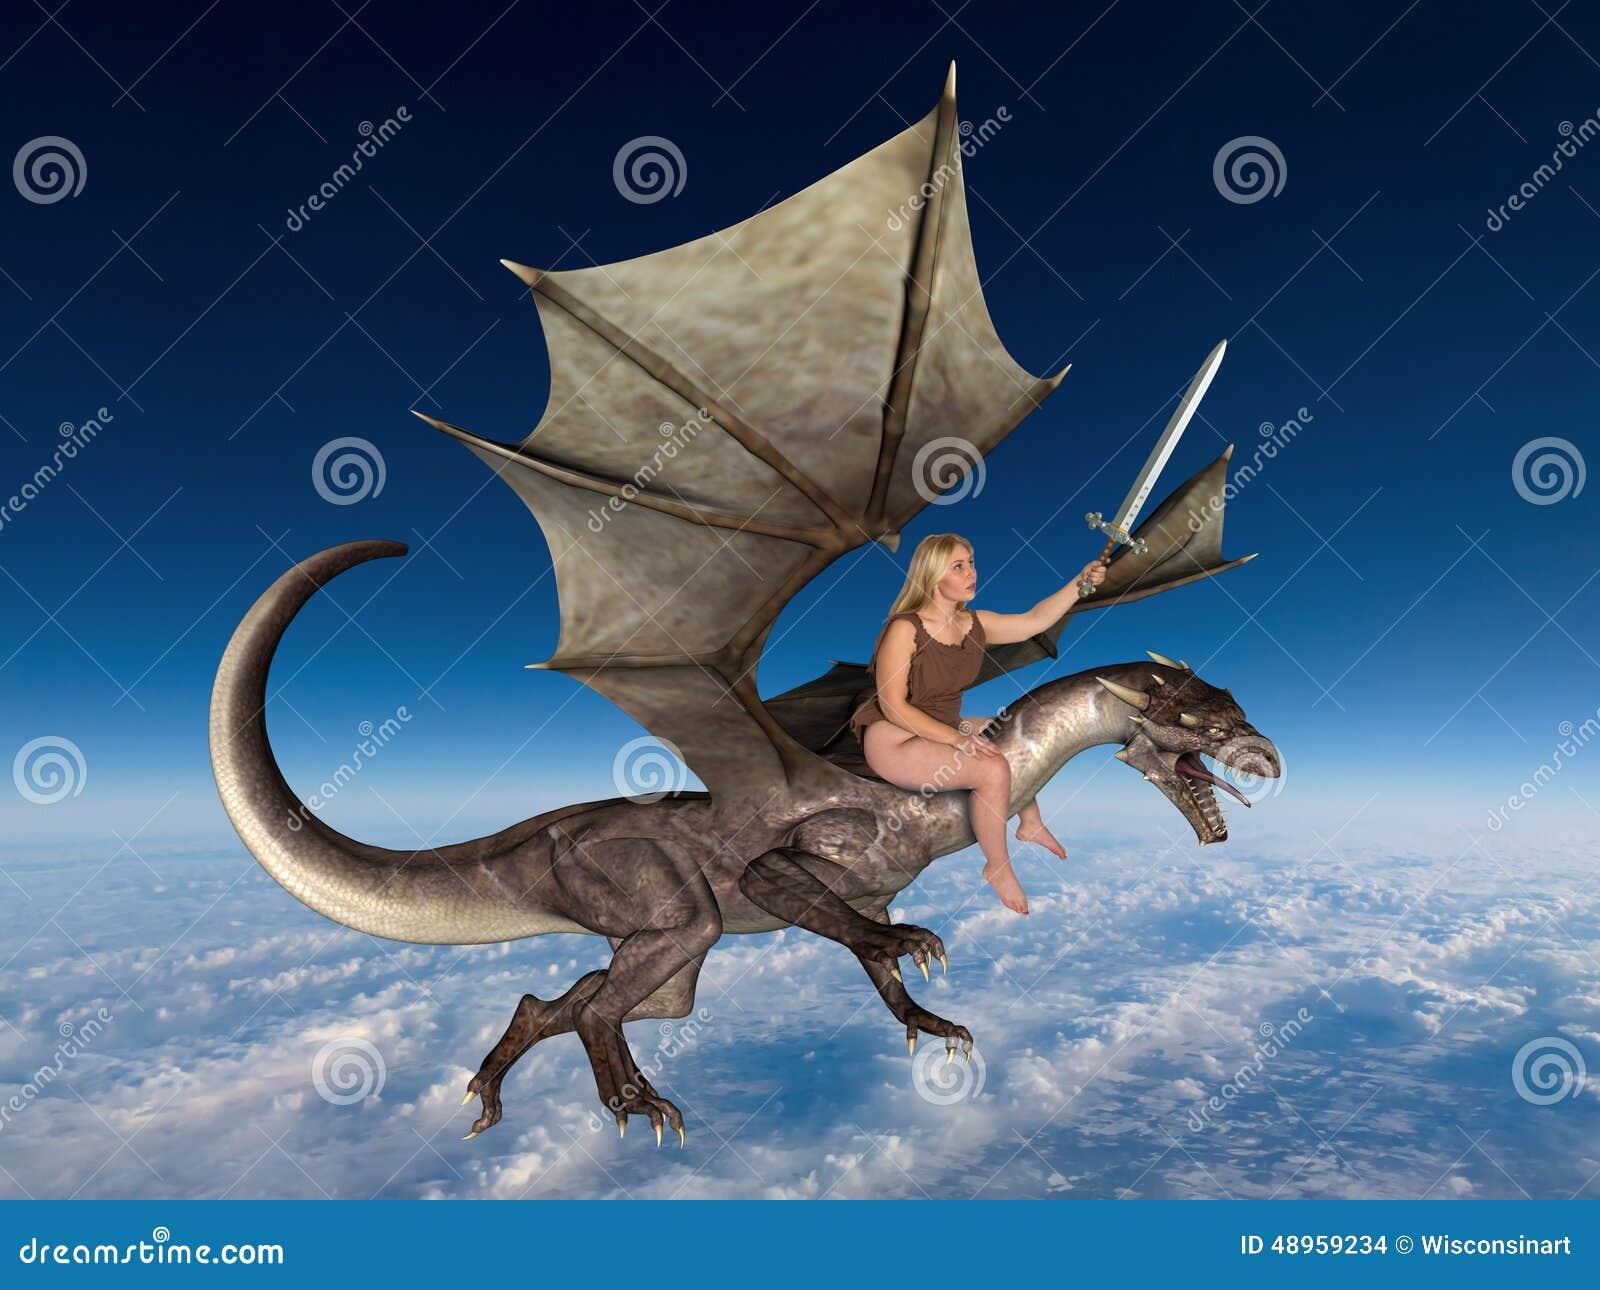 woman in a fant... Flying Fantasy Dragons